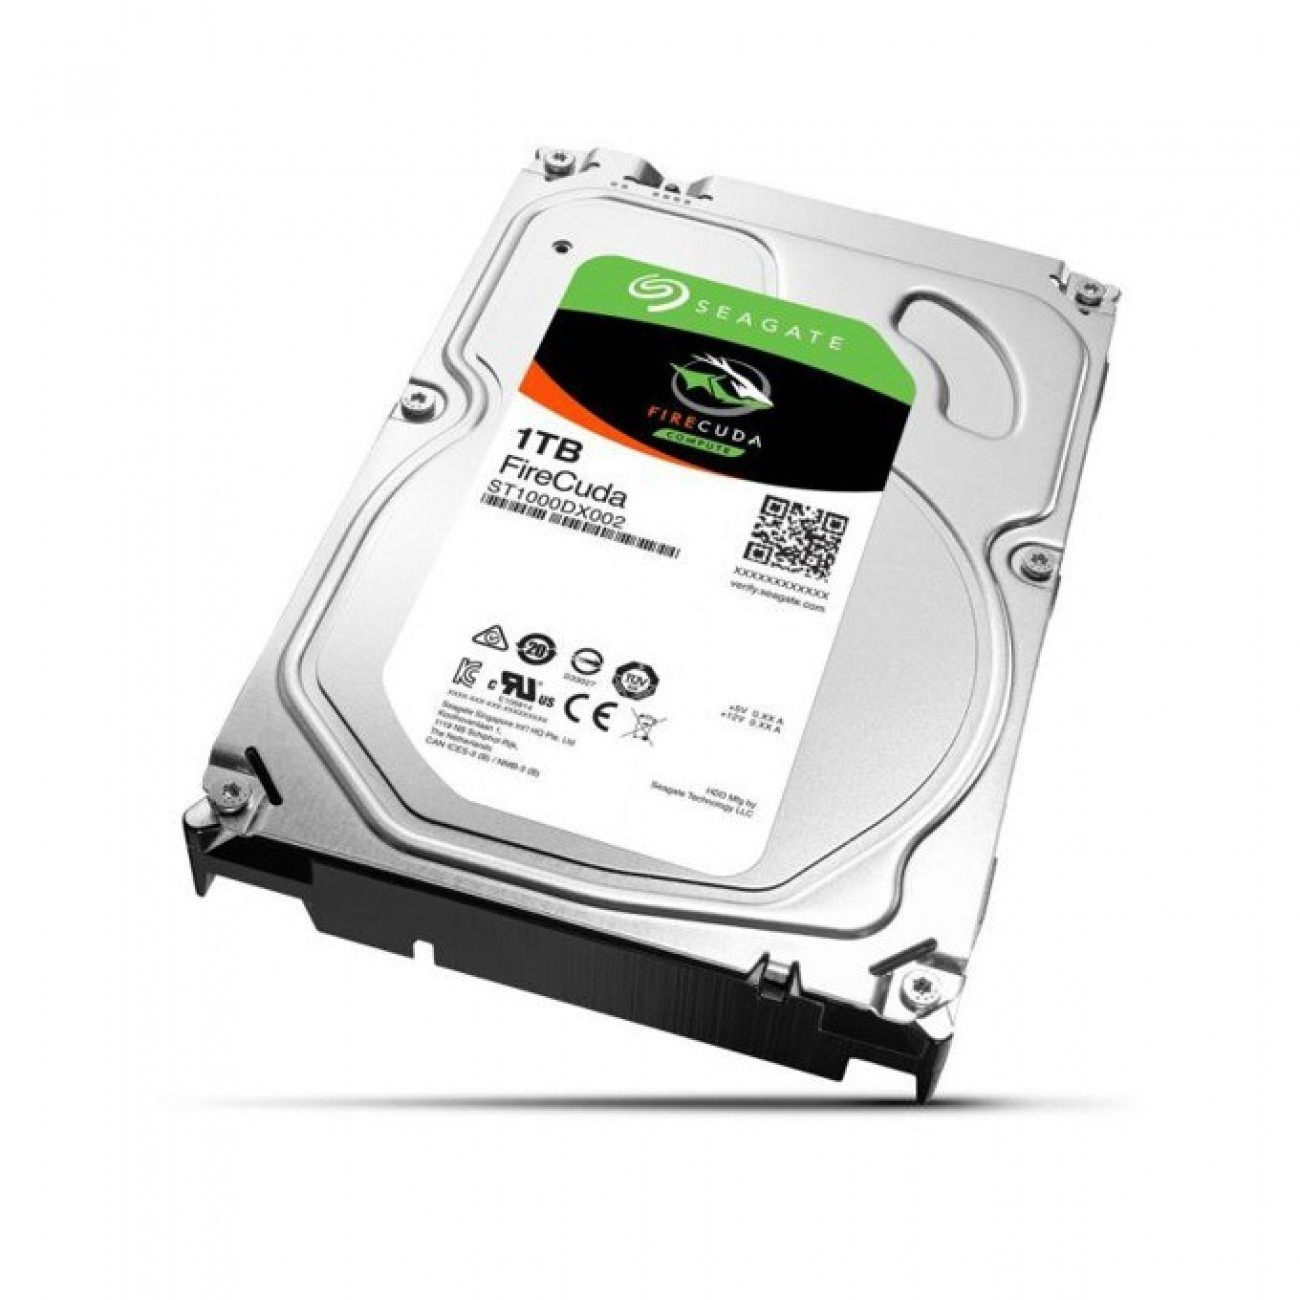 1TB Seagate FireCuda SSHD, 8GB MLC, SATA 6Gb/s, 7200rpm, 64MB, 3.5(8.89 cm) в Твърди дискове Вътрешни -  | Alleop